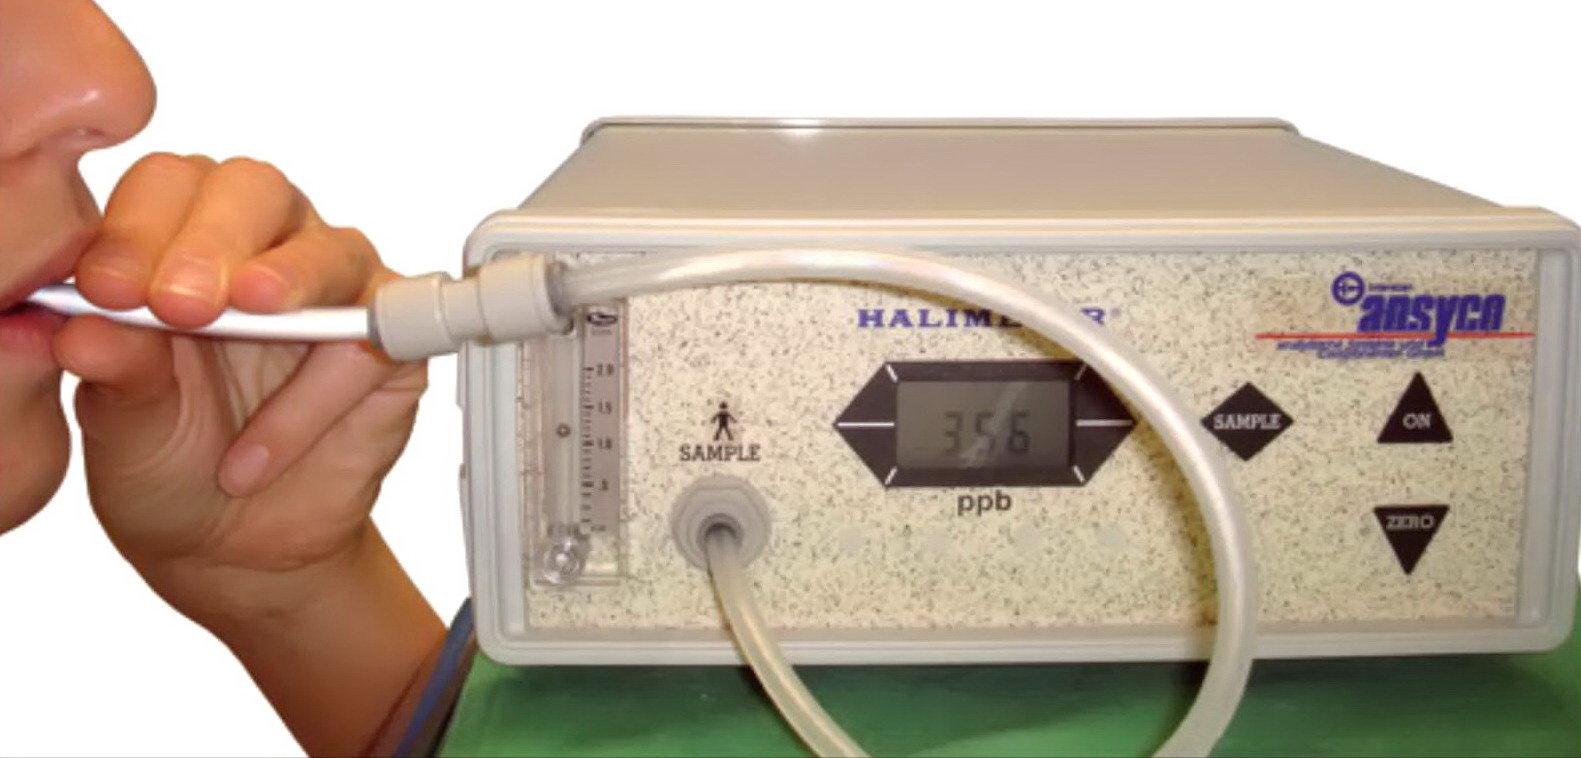 halimeter – Copia